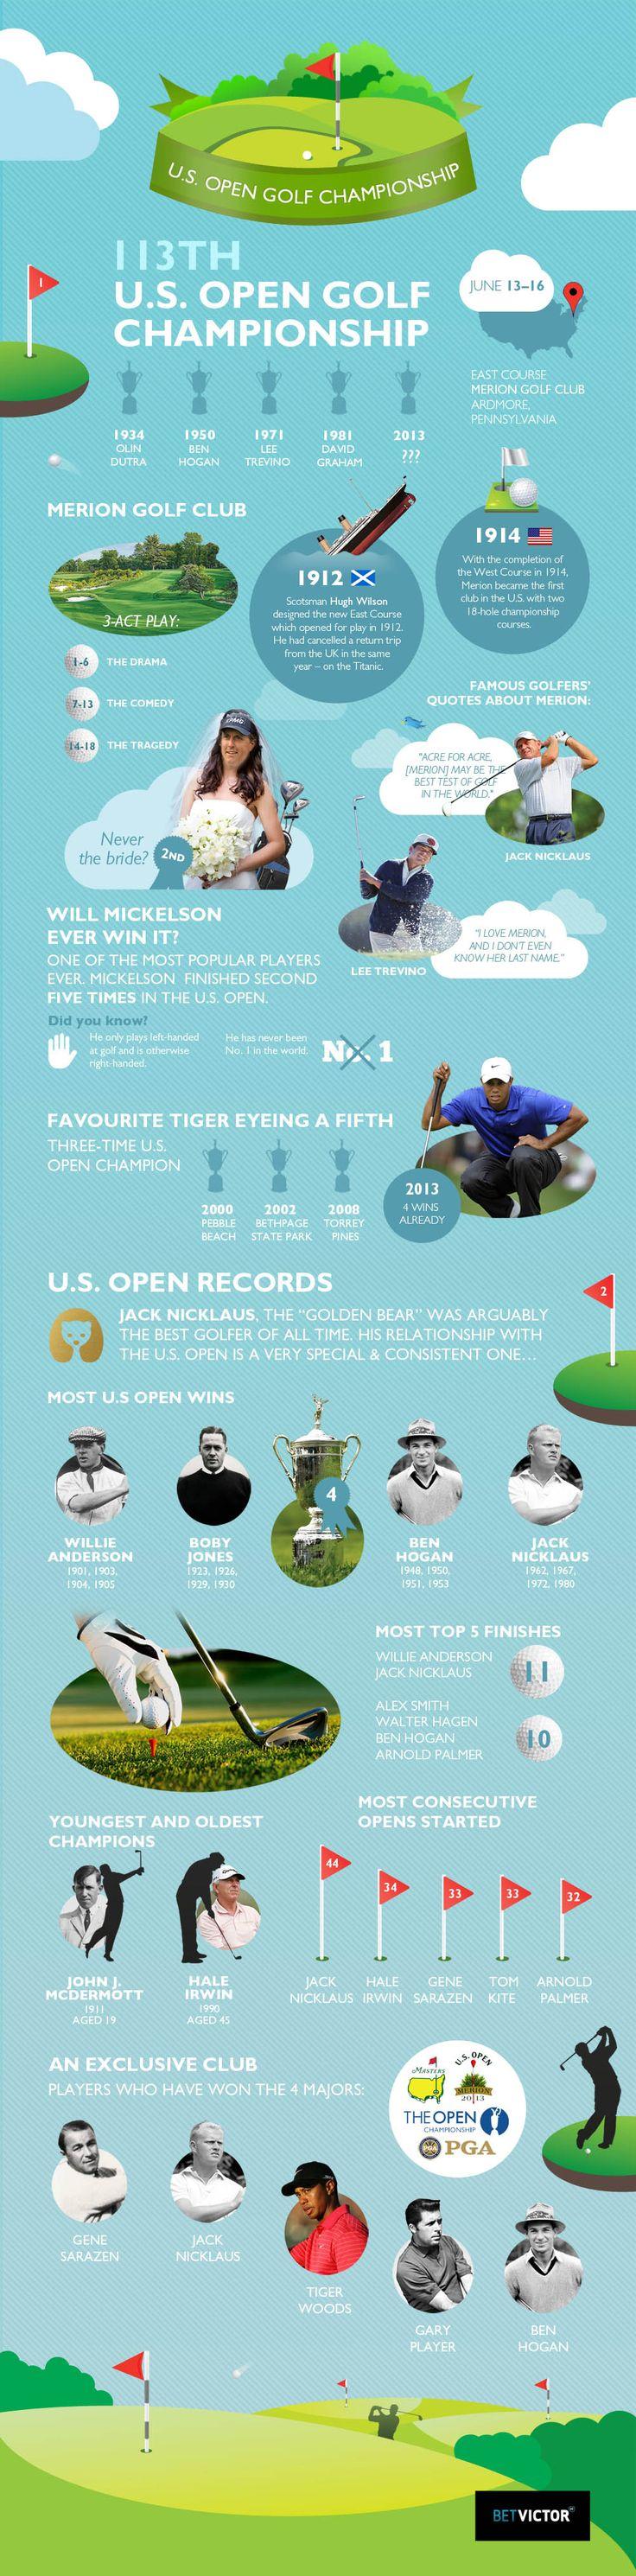 US Open Golf Championship